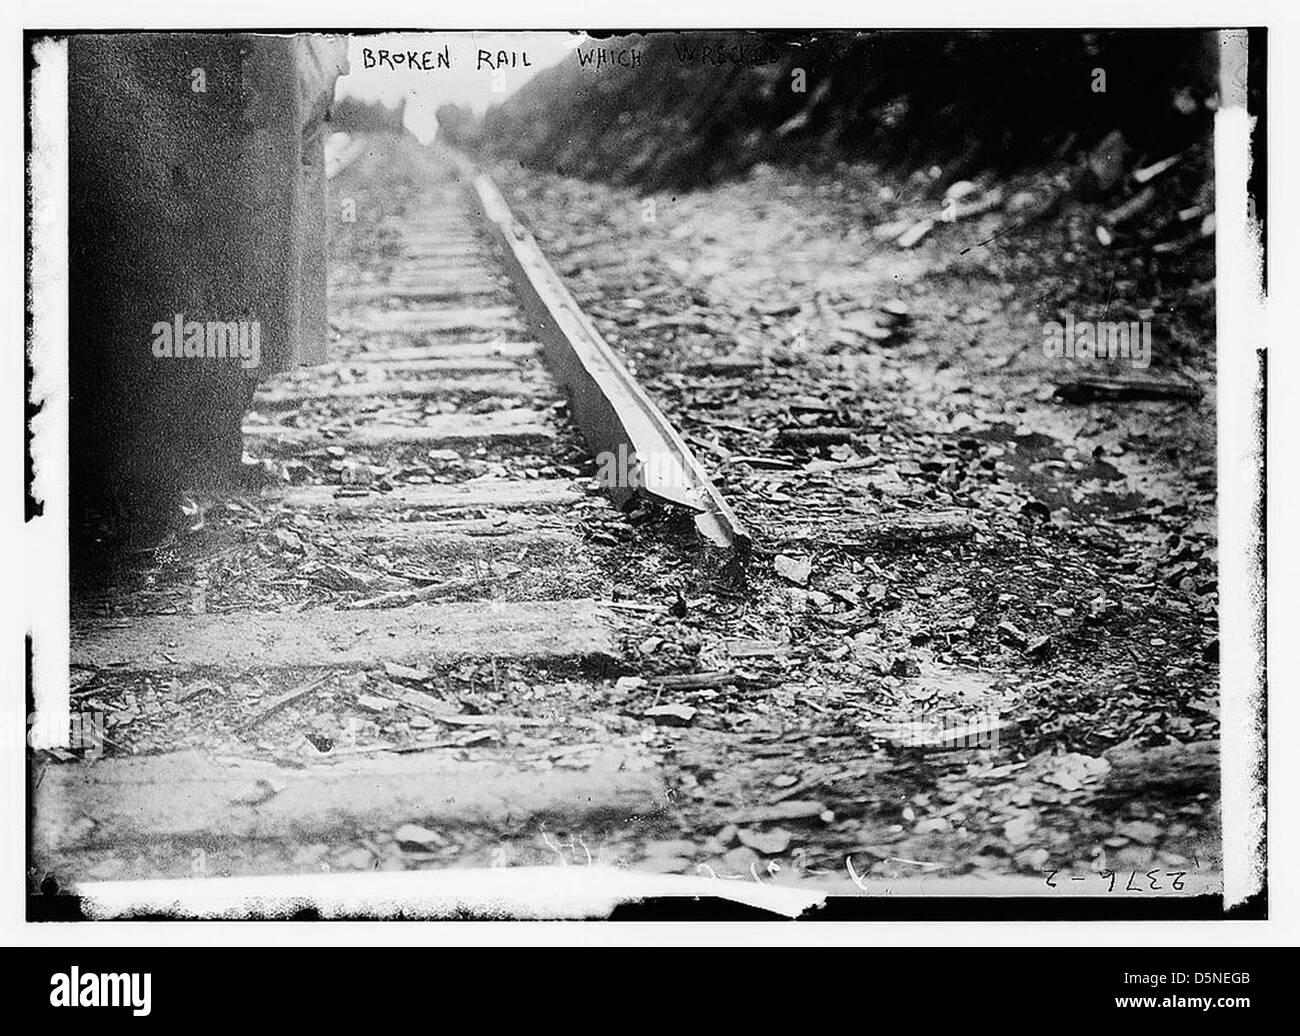 Broken rail which wrecked '20th Century' (LOC) - Stock Image